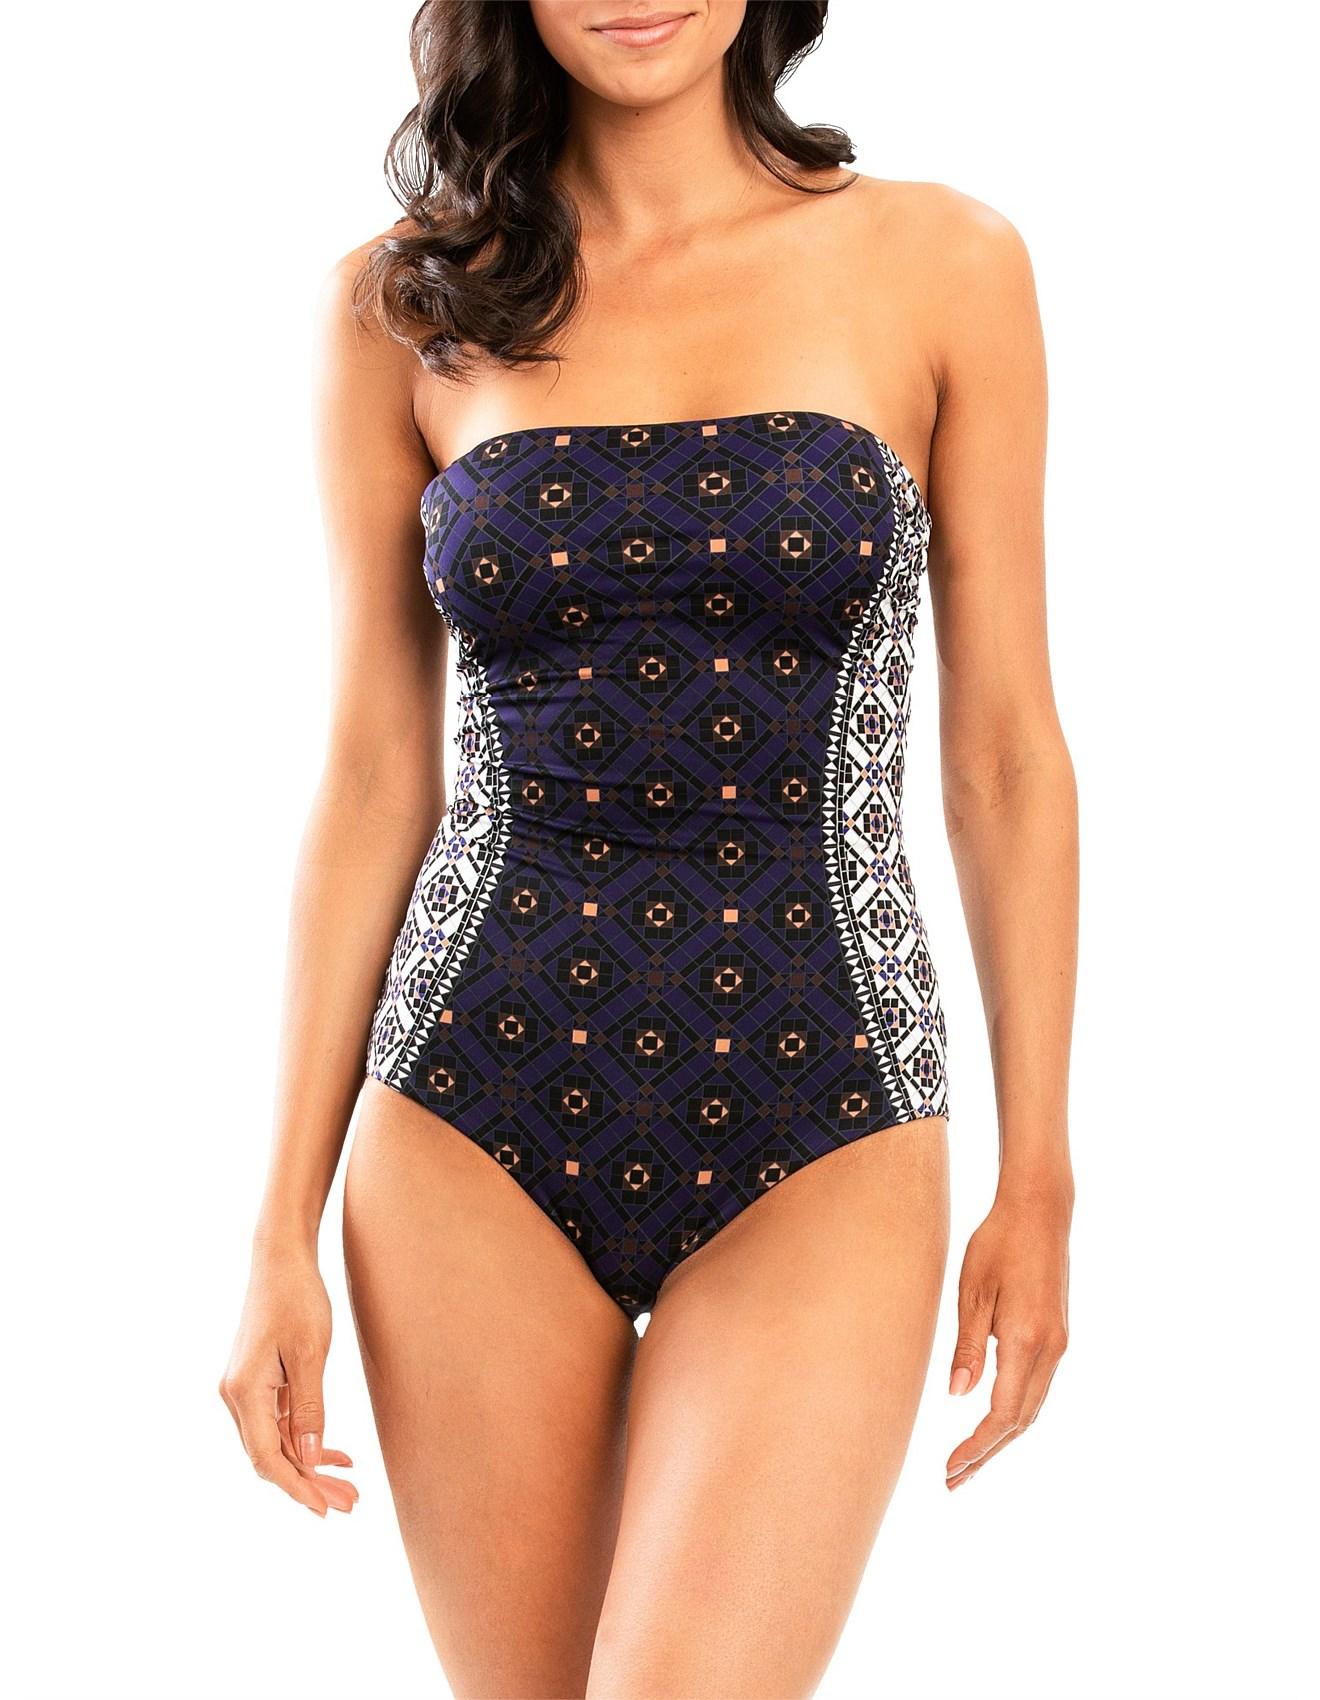 2c3366f438 One Piece Swimsuit Sale | Swimwear Sale | David Jones - Enchant Bandeau One  Piece